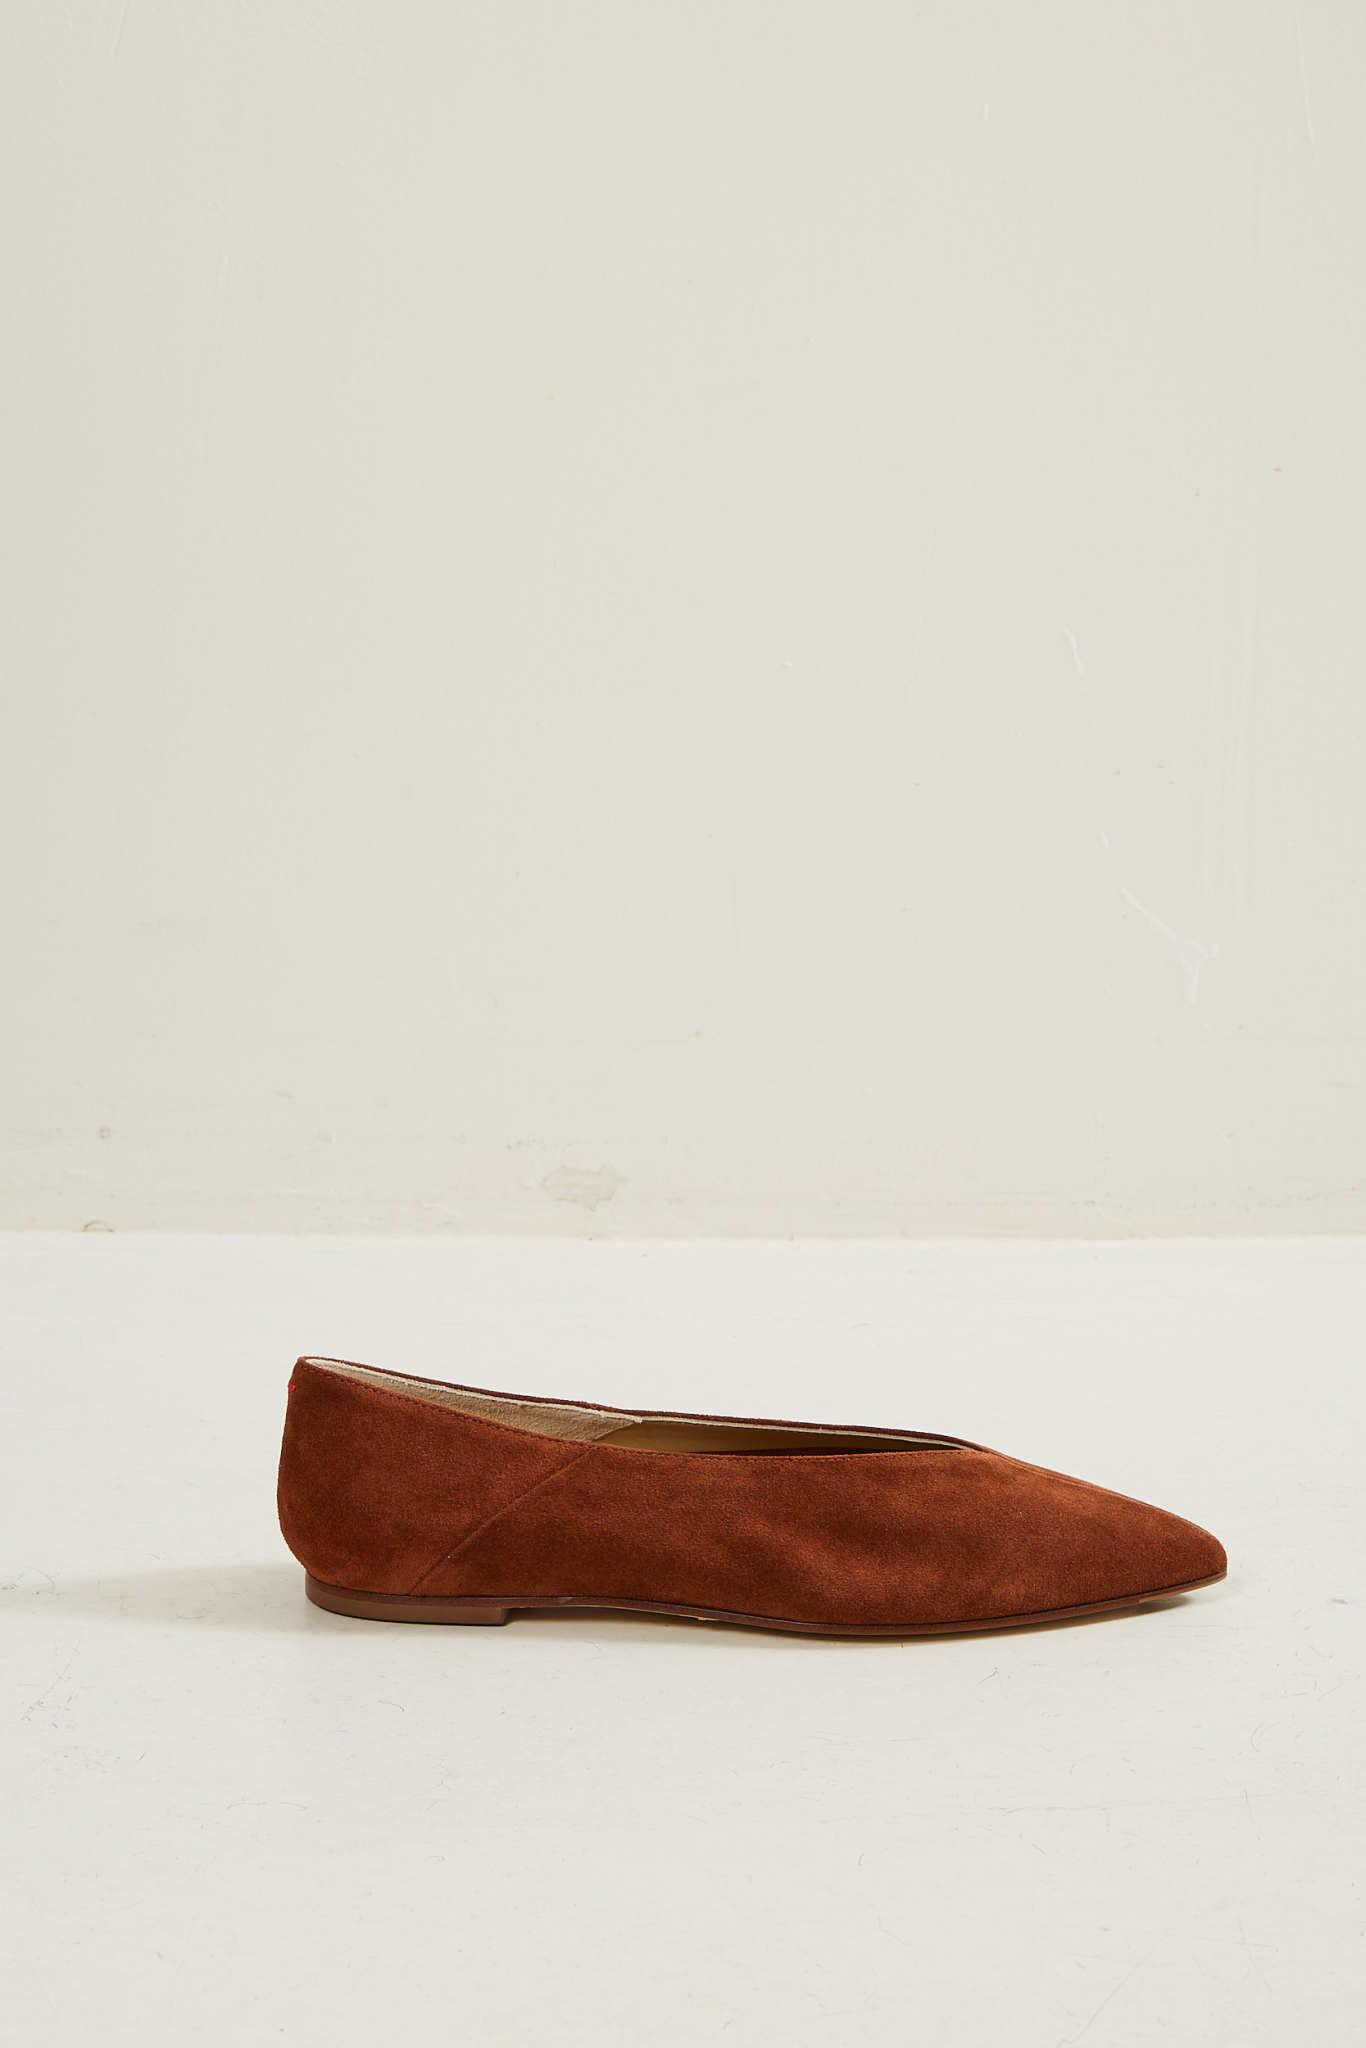 Aeyde - Moa ballerina shoes.